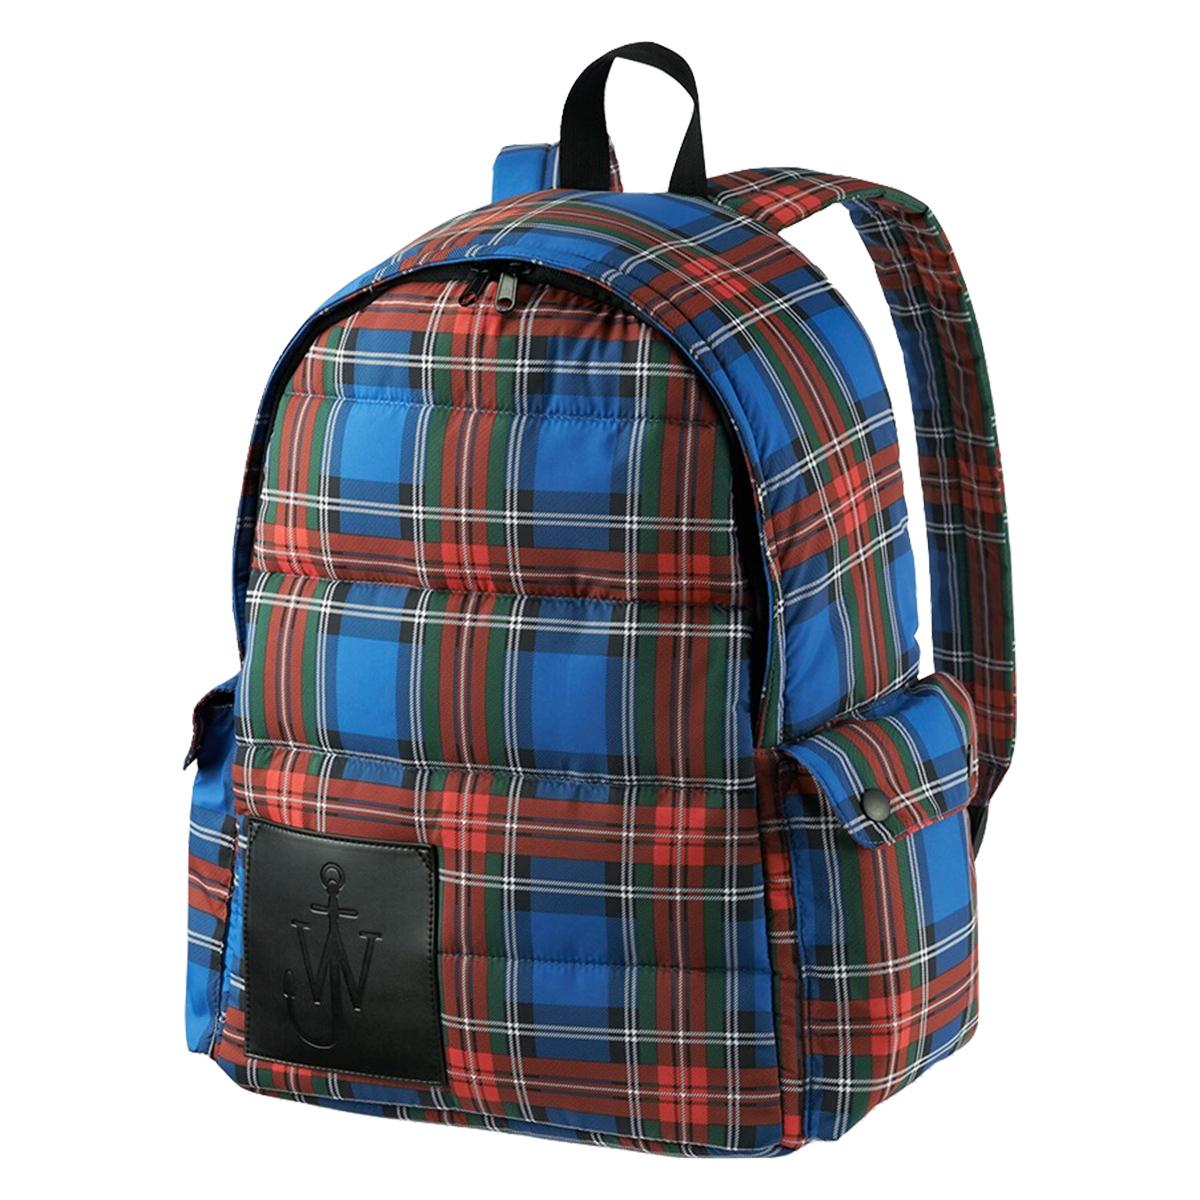 UNIQLO X JW Anderson Backpack